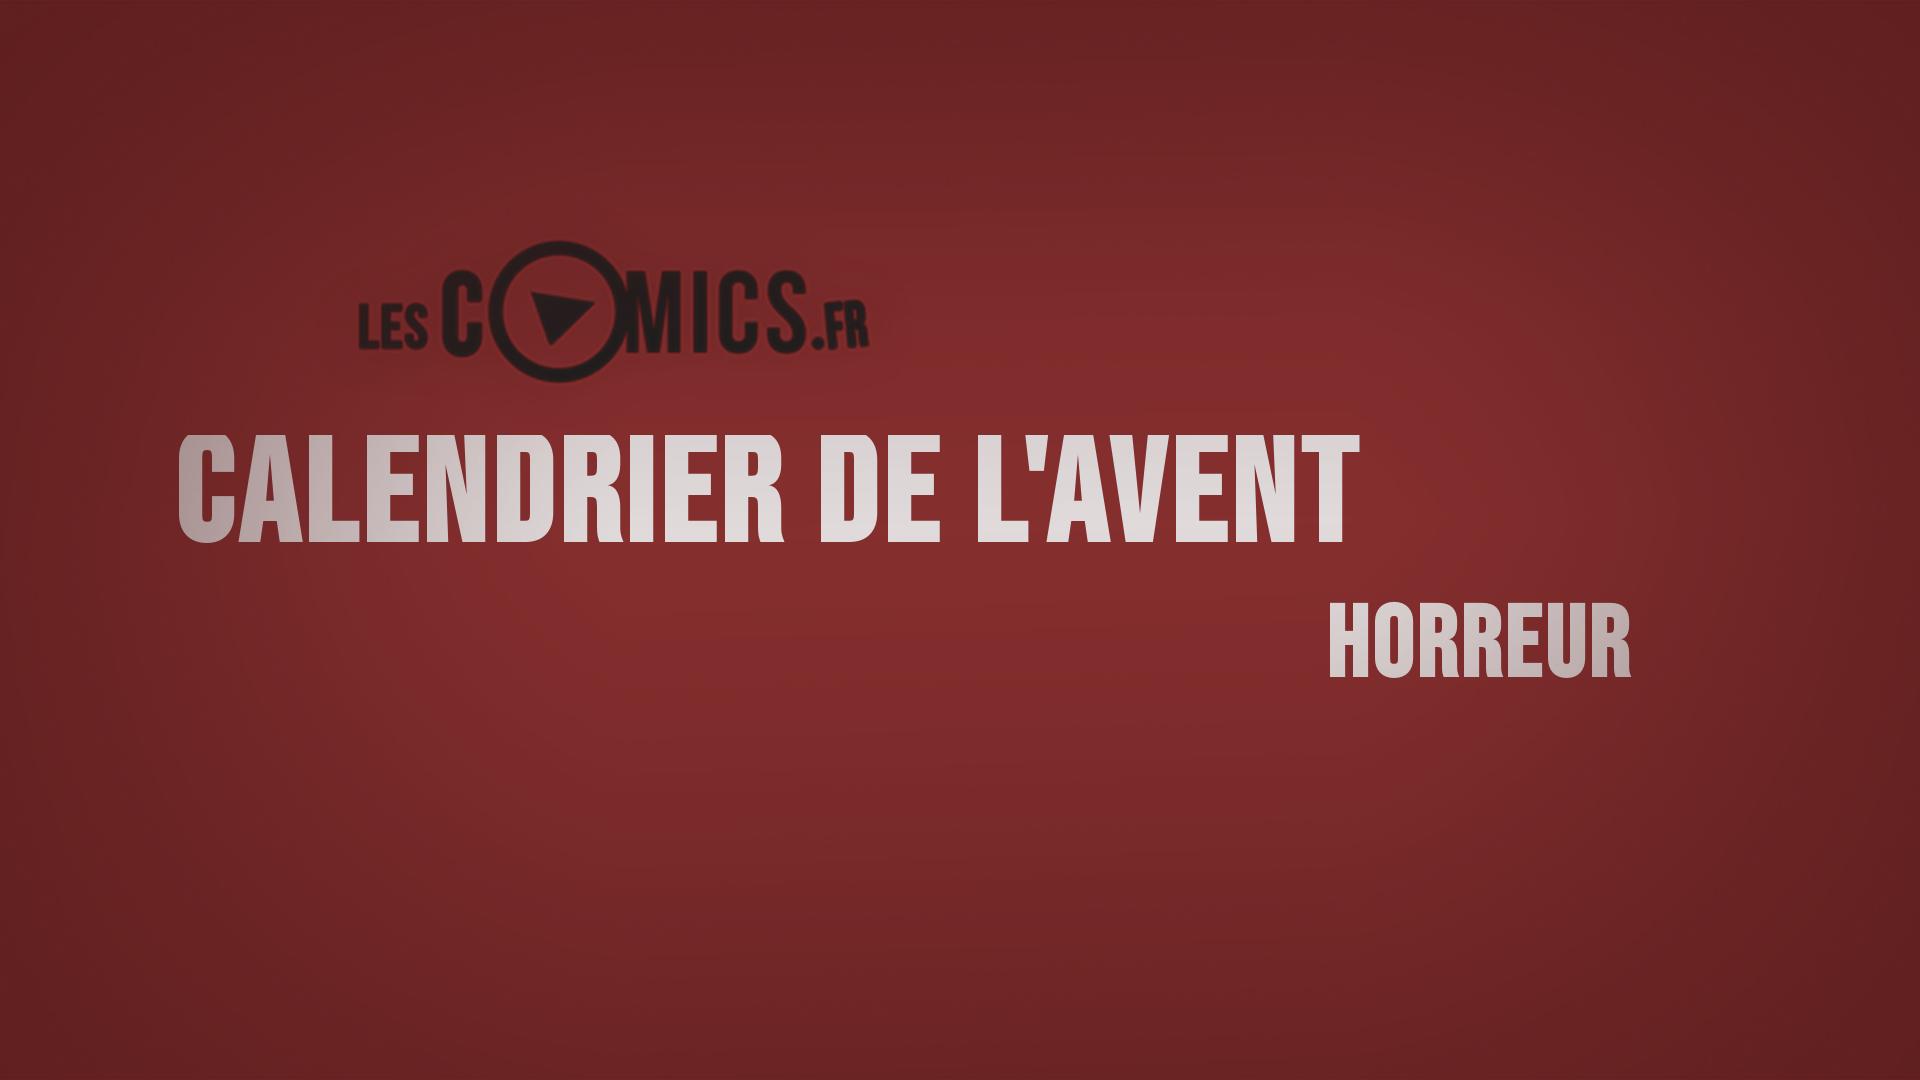 Calendrier Satanique 2019.Calendrier De L Avent Jour 9 Horreur Lescomics Fr